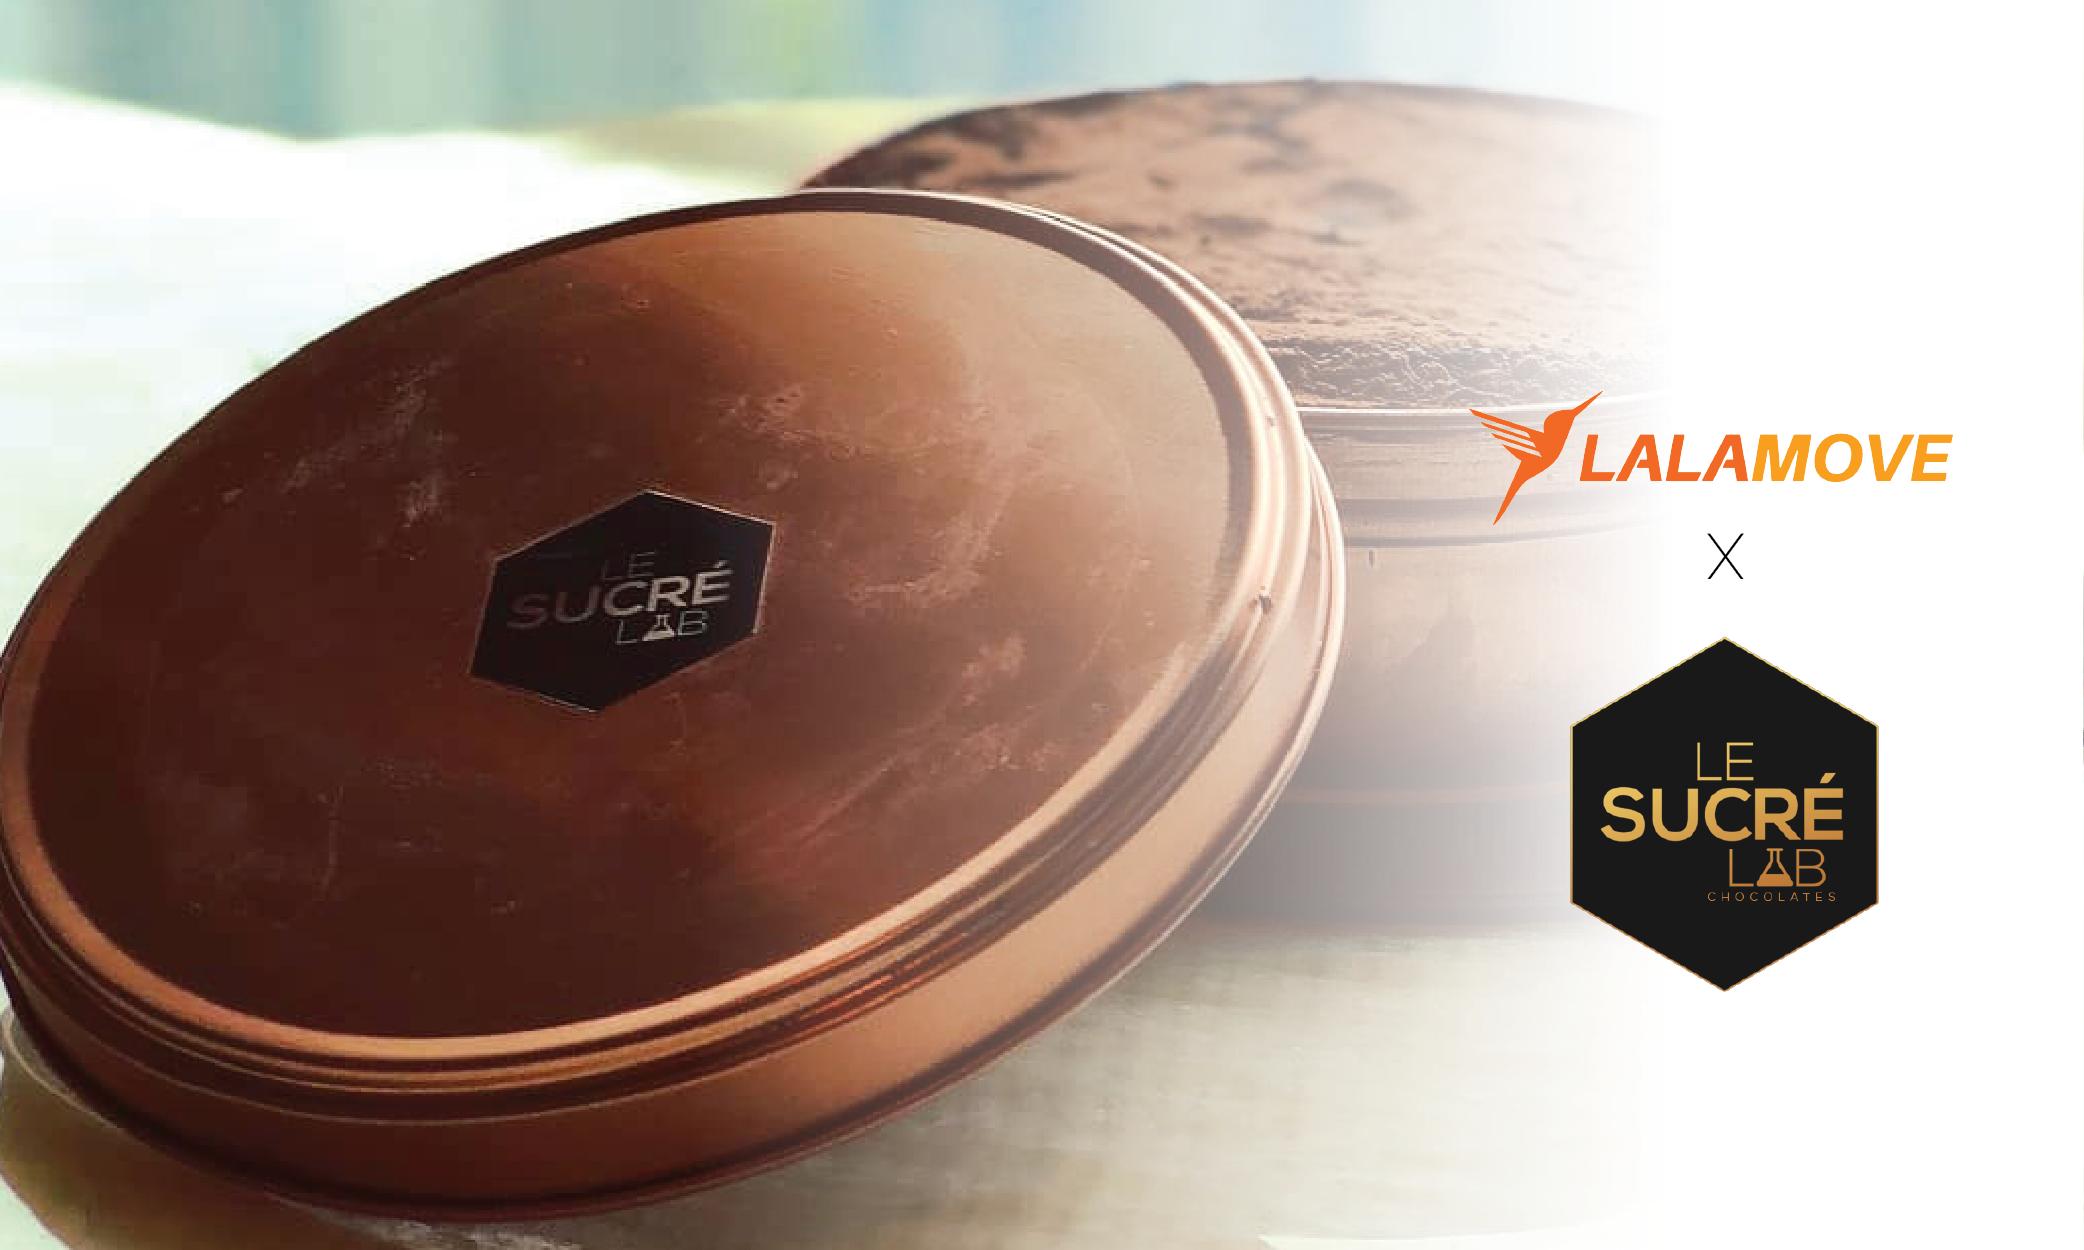 Le Sucre Lab Chocolates